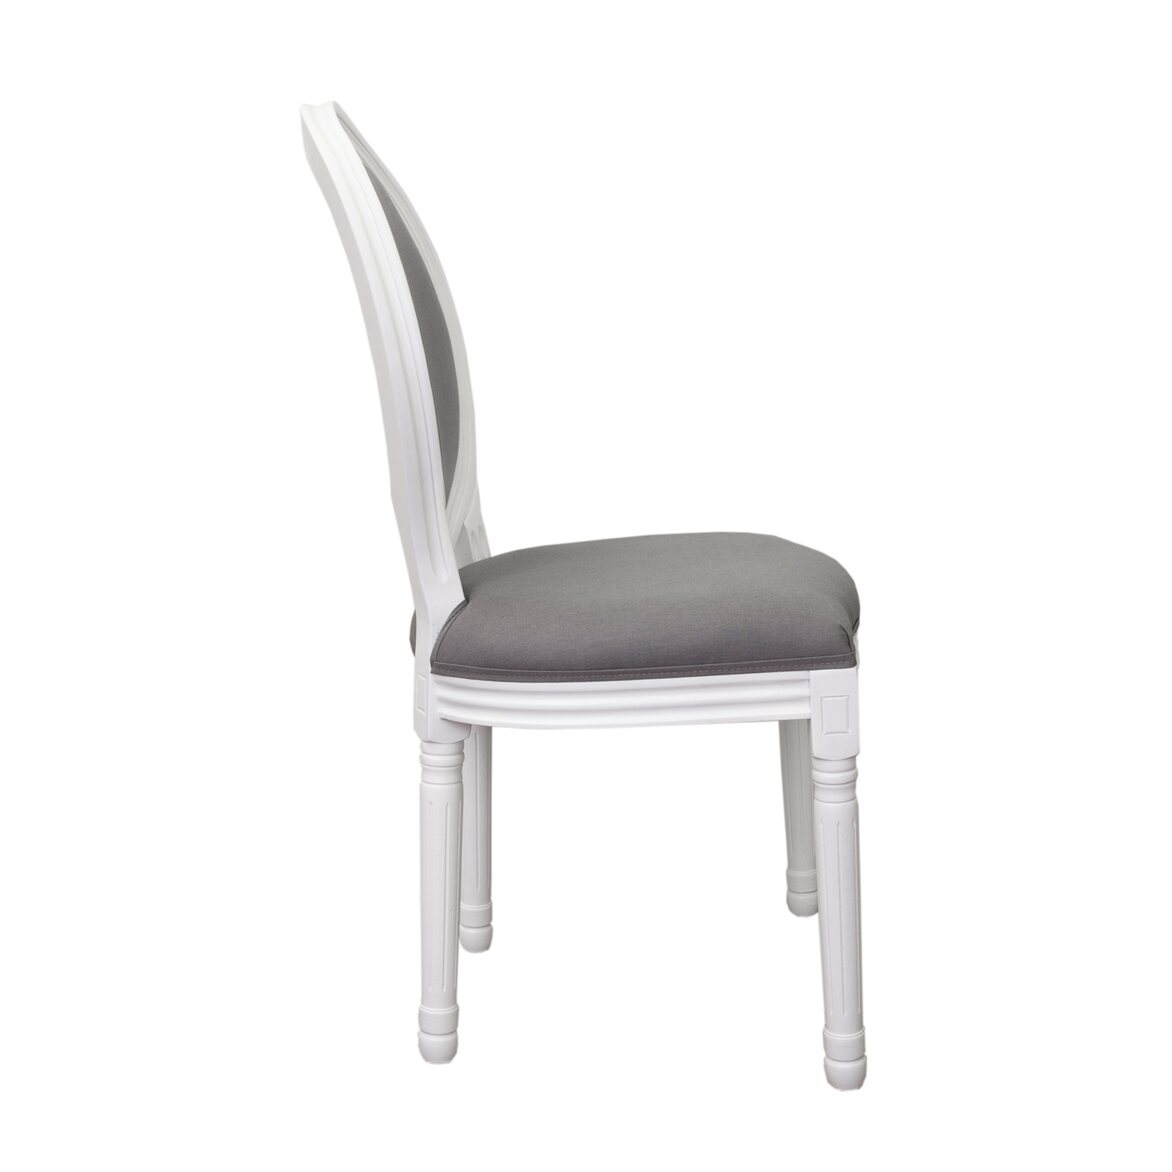 Стул Volker grey+white 2 | Обеденные стулья Kingsby